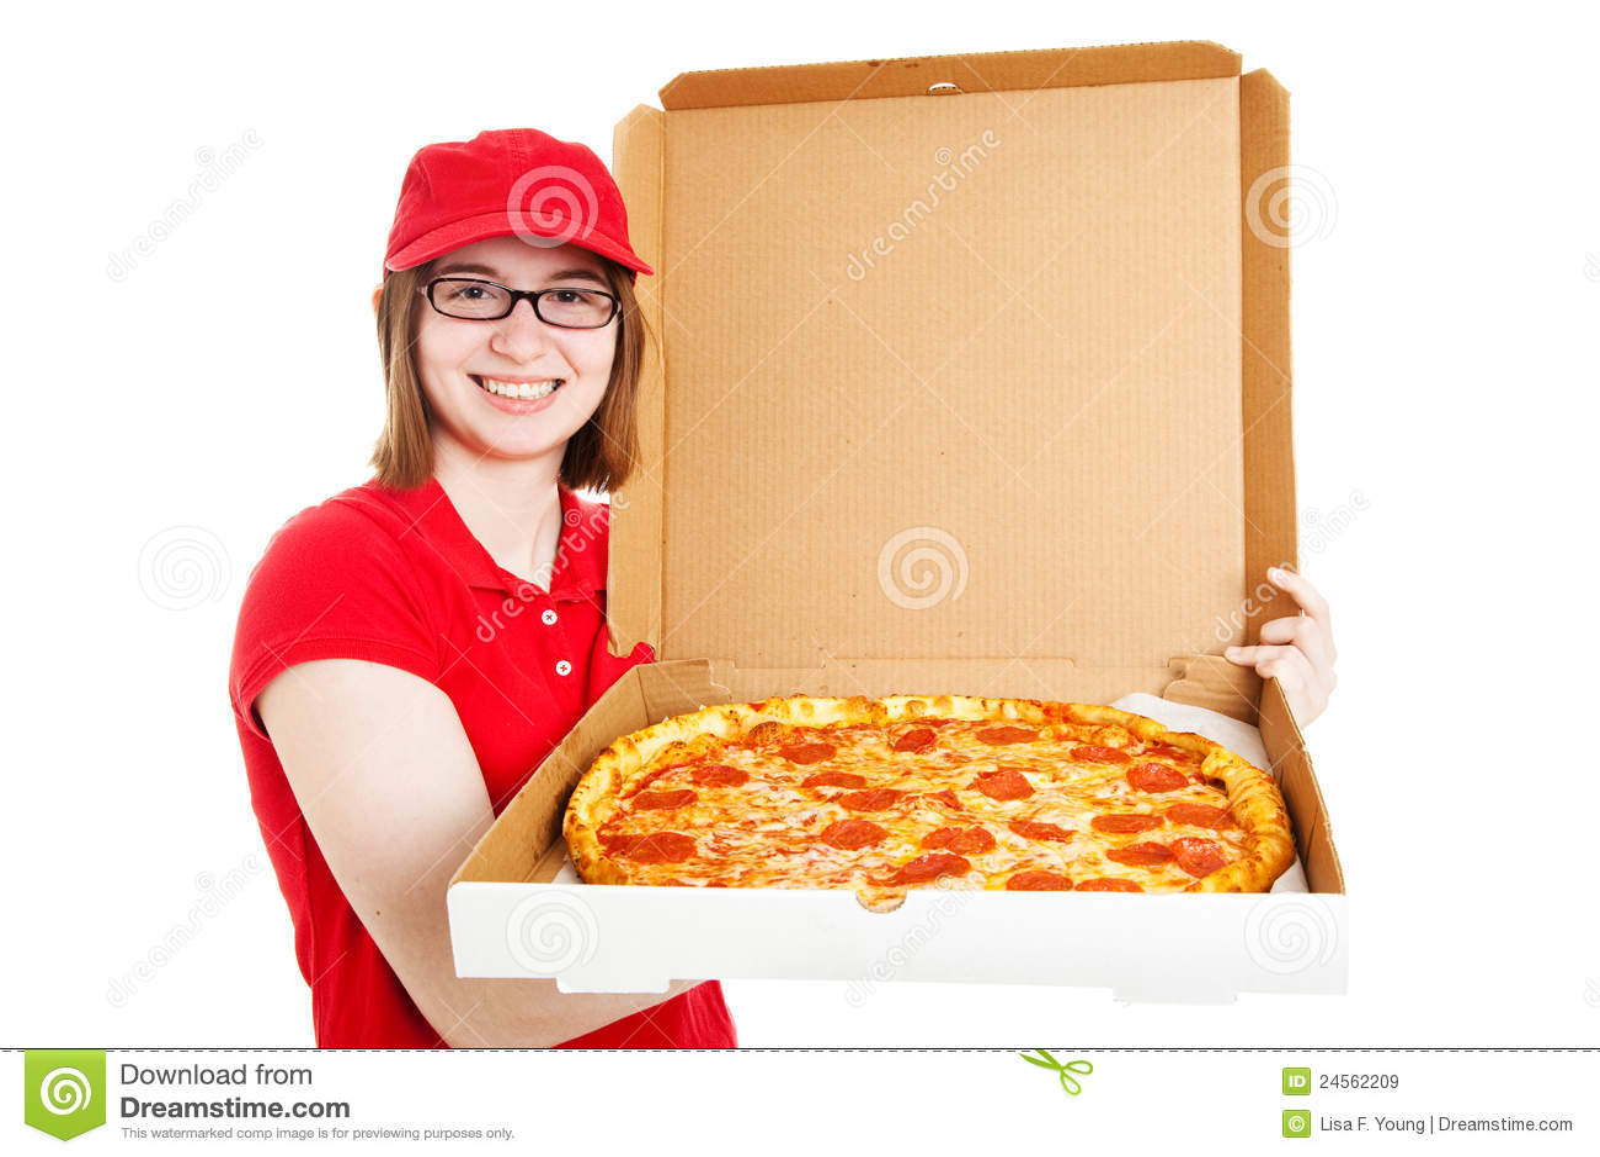 engesvang pizza free sex m